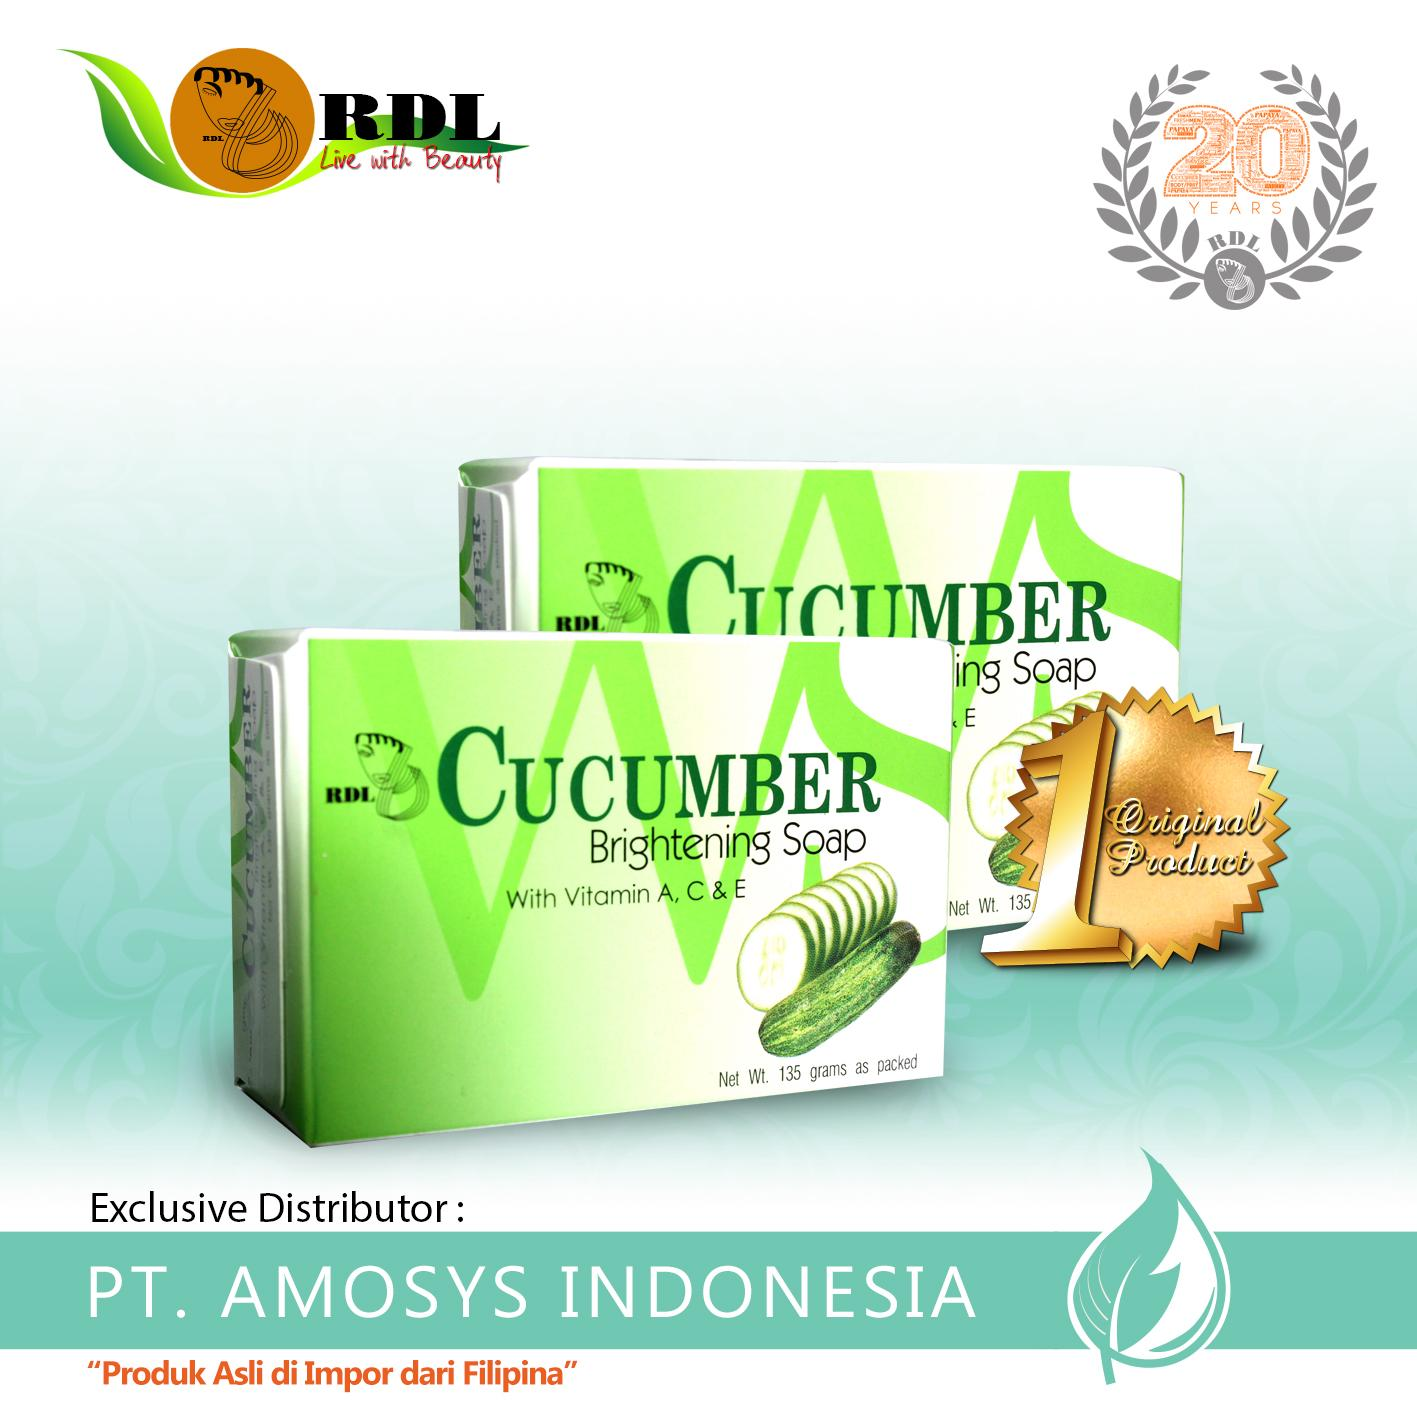 Kelebihan Bar Soap Rdl Papaya Extract With Milk 135gr Distributor Sabun Brightening Original Bpom By Mamaya Cucumber